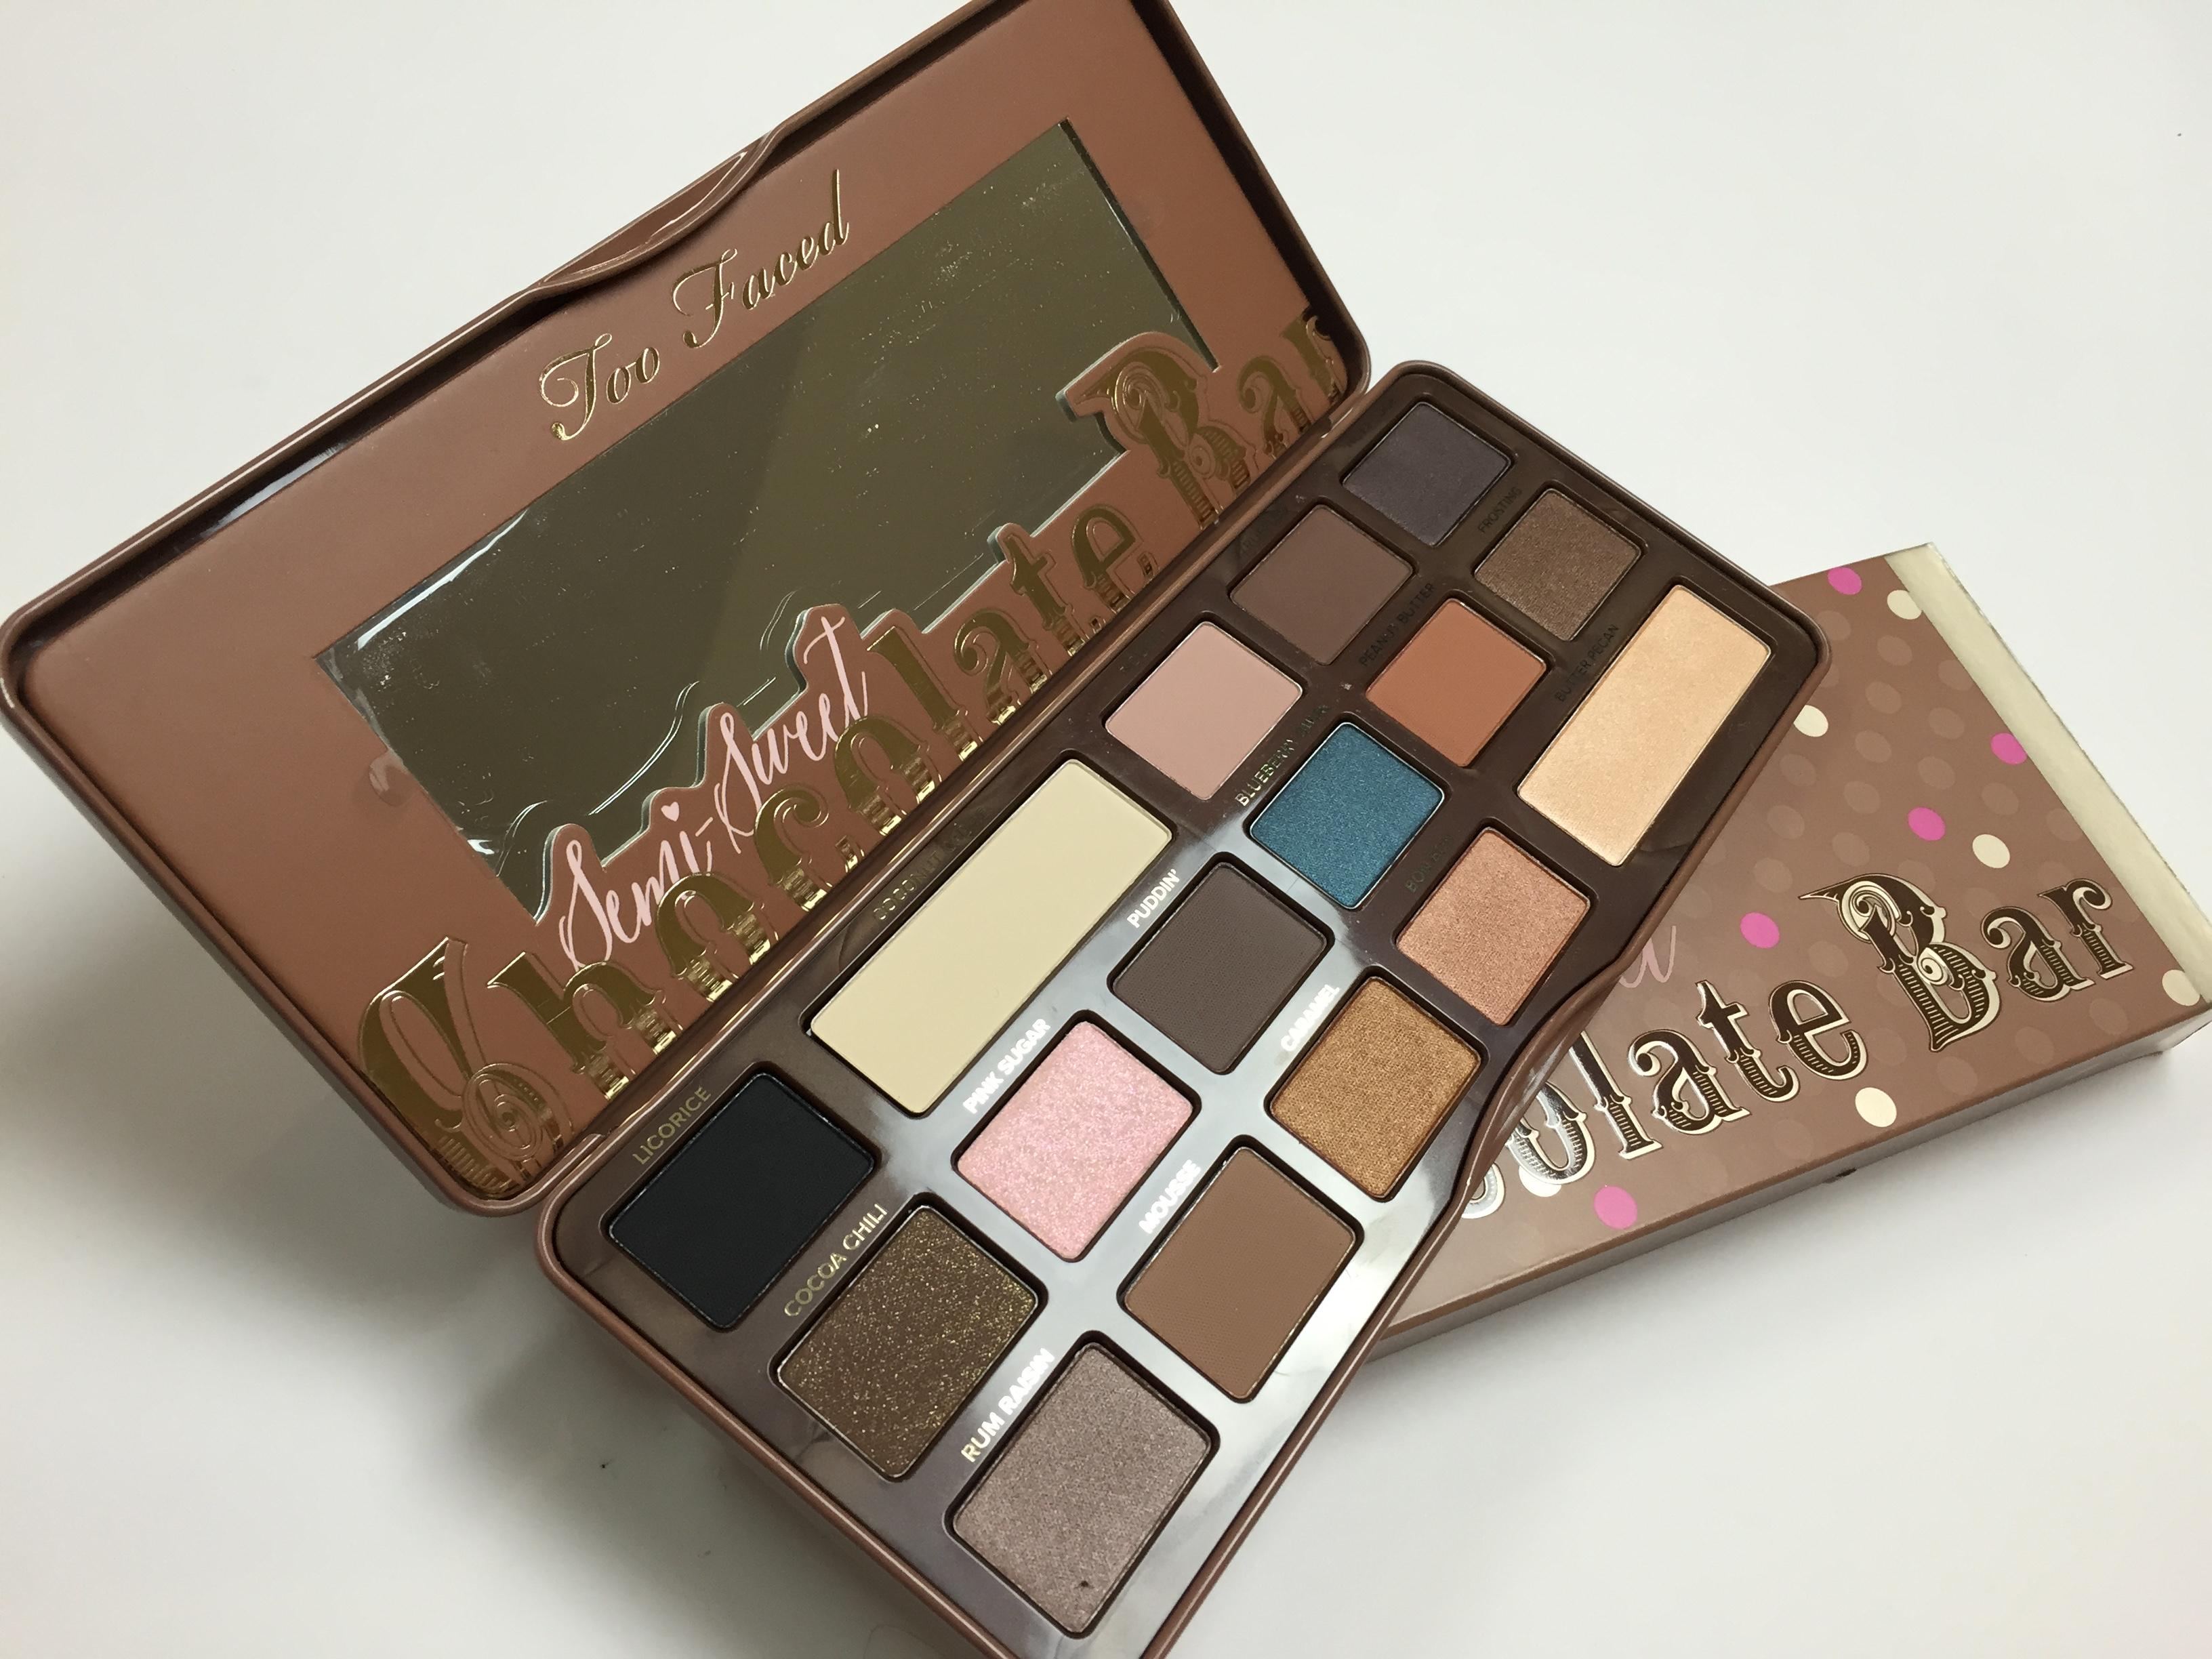 La palette semi sweet chocolate bar de too faced - Tablette de maquillage ...